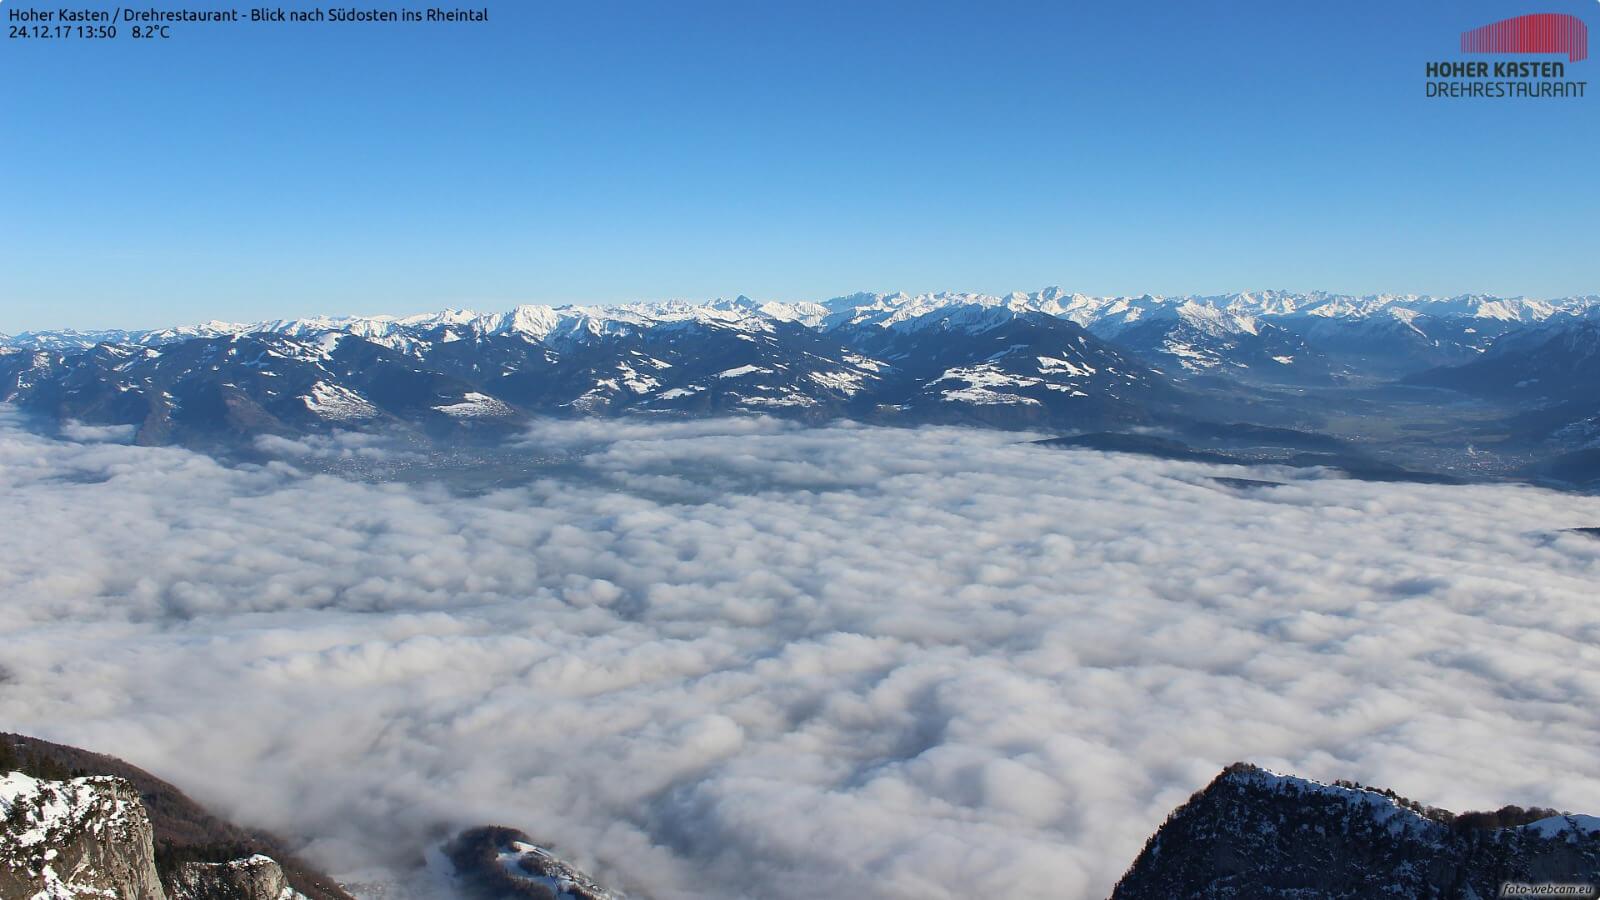 Über dem Nebel strahlend sonnig ©http://www.foto-webcam.eu/webcam/hoherkasten